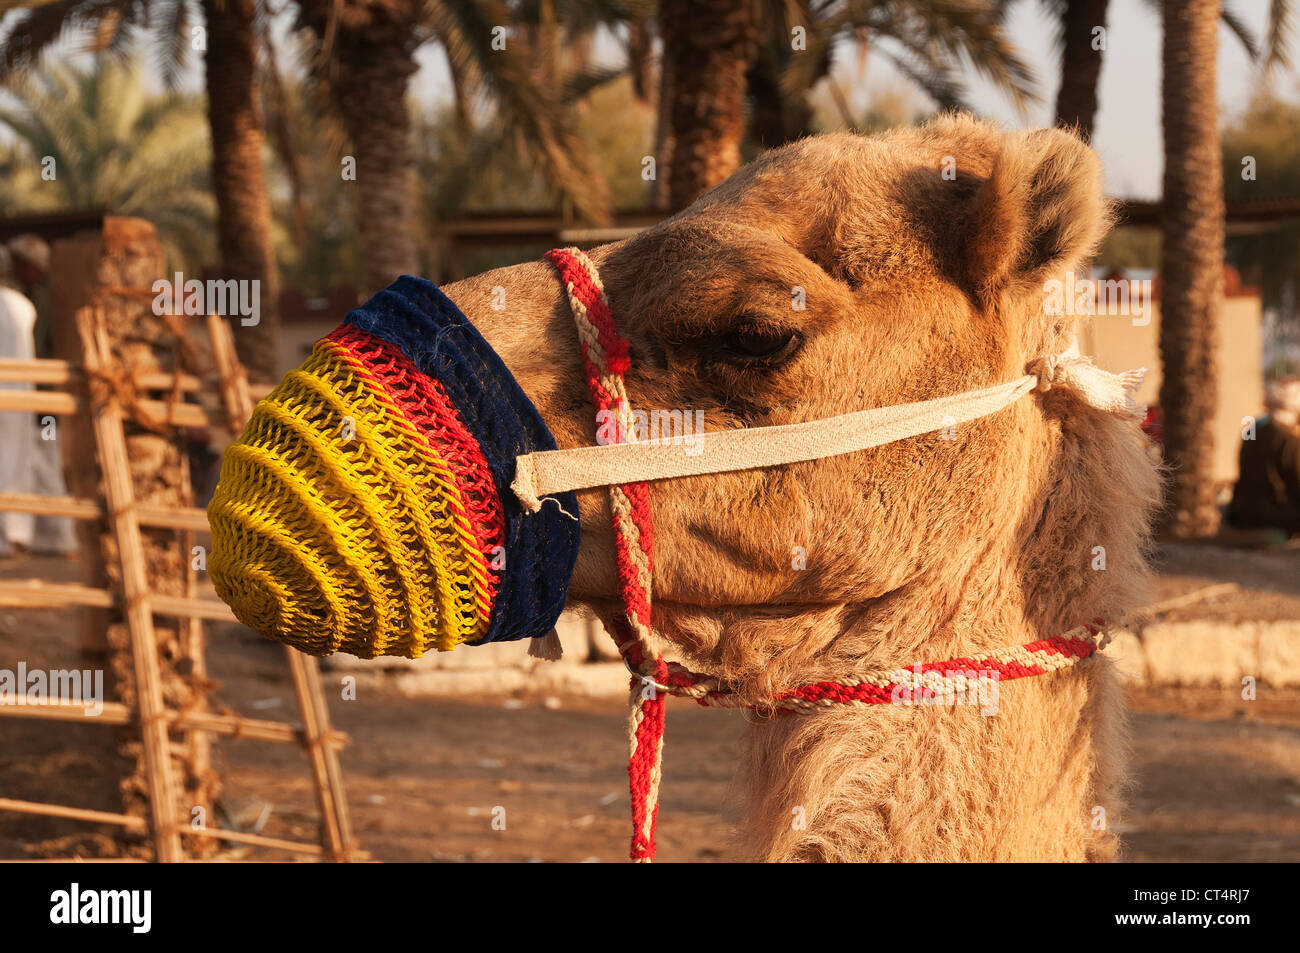 Elk207-1389 Oman, Muscat, Muscat Festival, camel - Stock Image